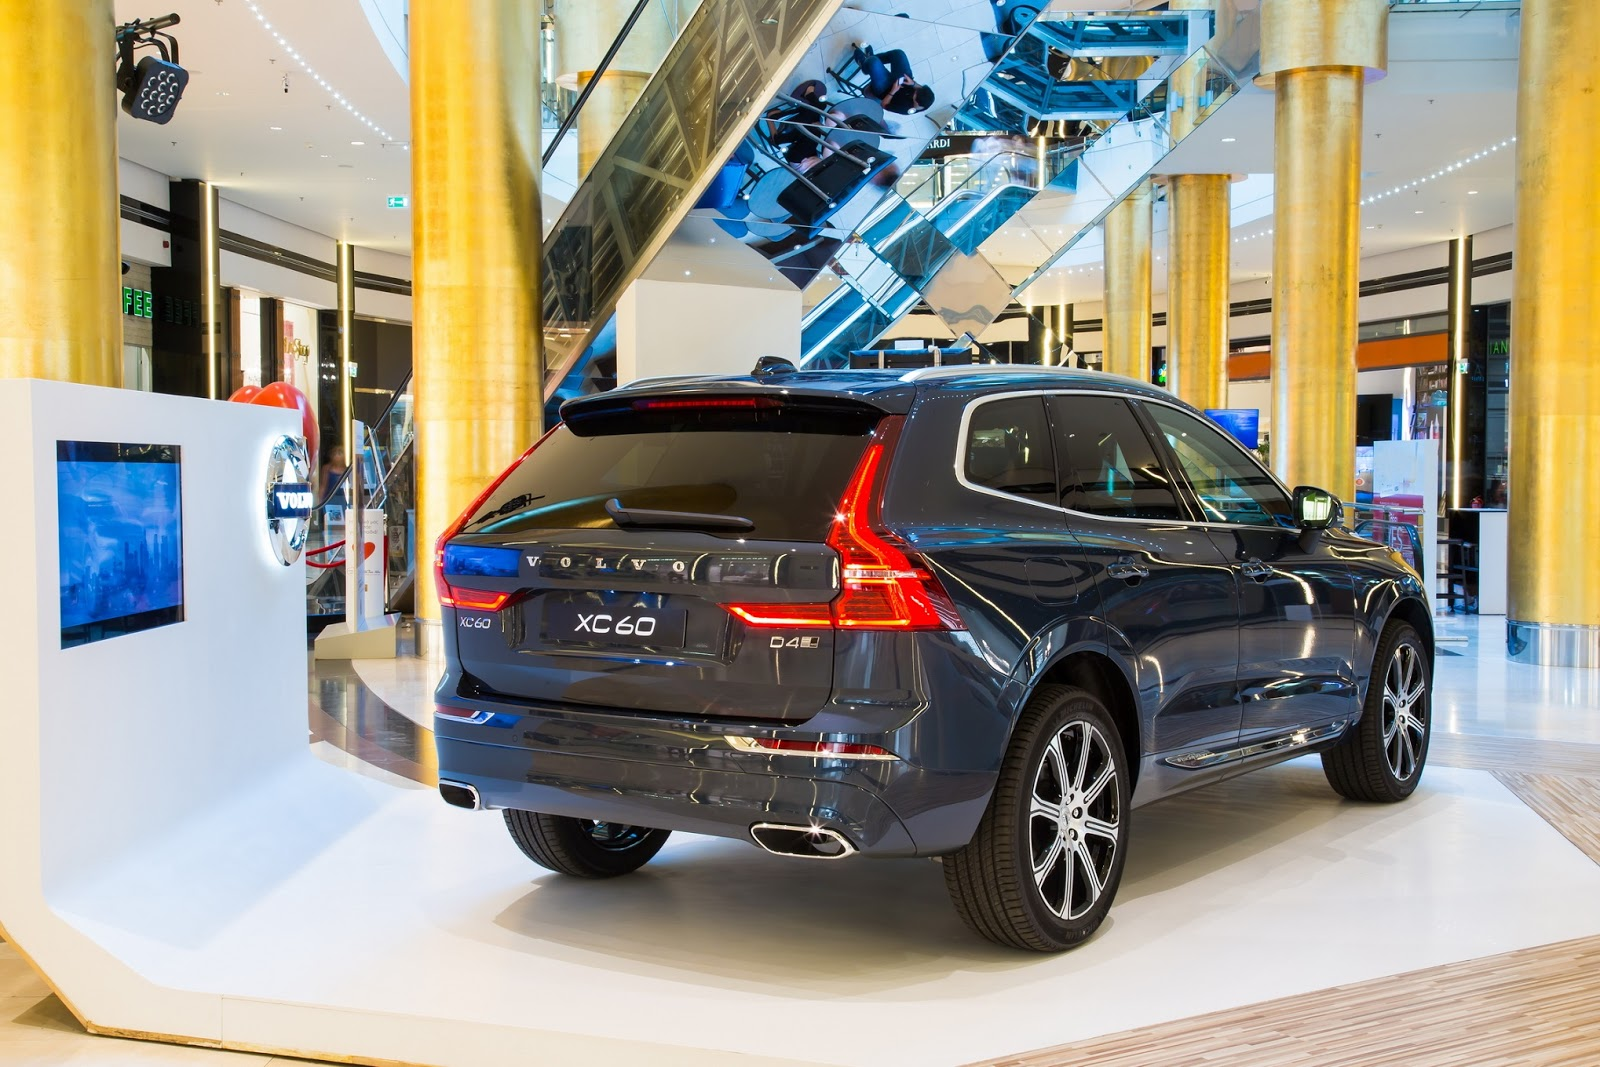 NEW2BVOLVO2BXC602B2540GOLDEN2BHALL DENIM2BBLUE 3 Από 53.490 ευρώ οι τιμές του νέου XC60 Volvo, Volvo XC60, αυτοκίνητα, καινούργιο, καινούρια, τιμες